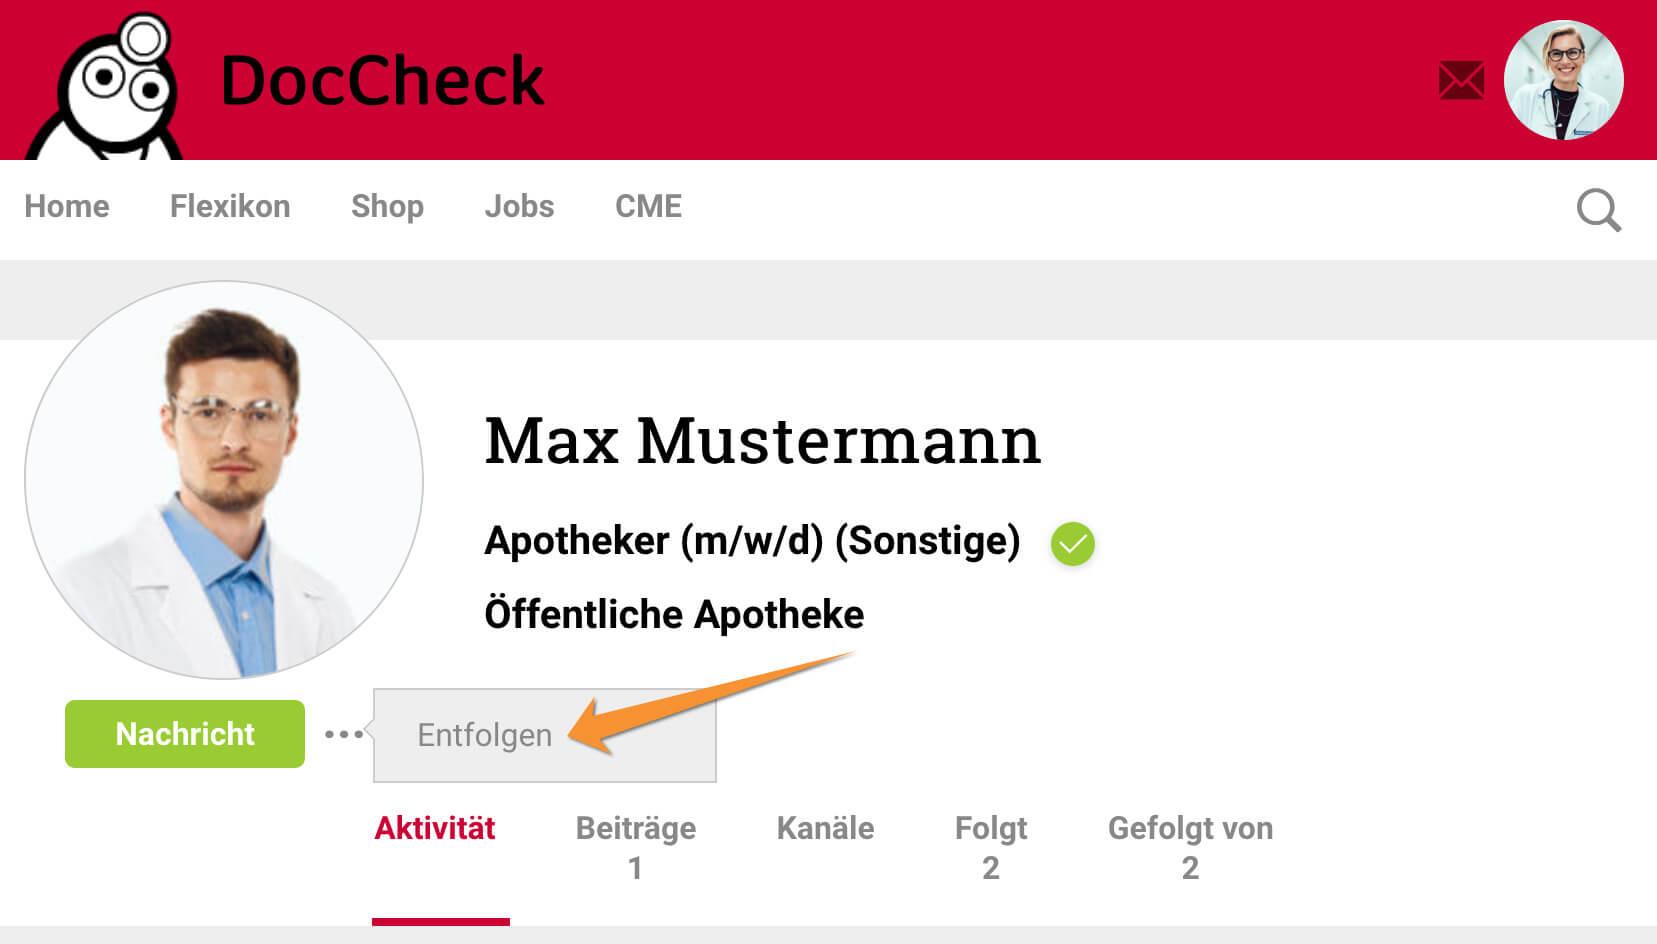 profilseite_entfolgen-button_max_de_original.jpg